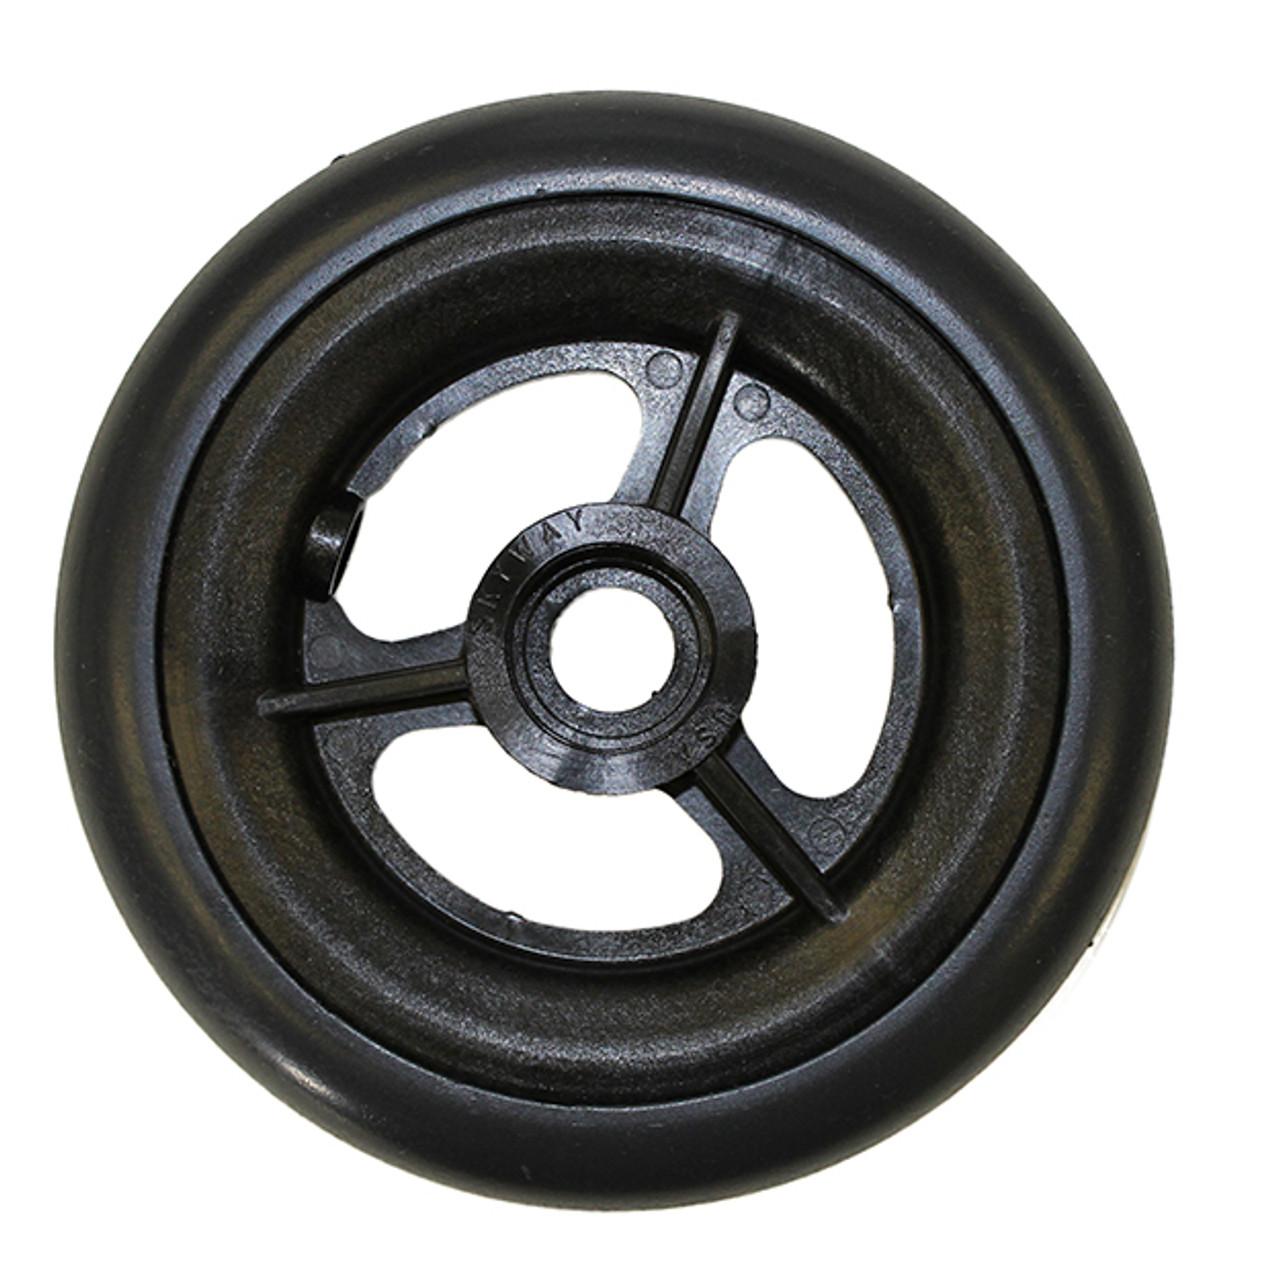 "5 x 1"" 3 SPOKE MAG Caster Wheel Urethane Round Tire"